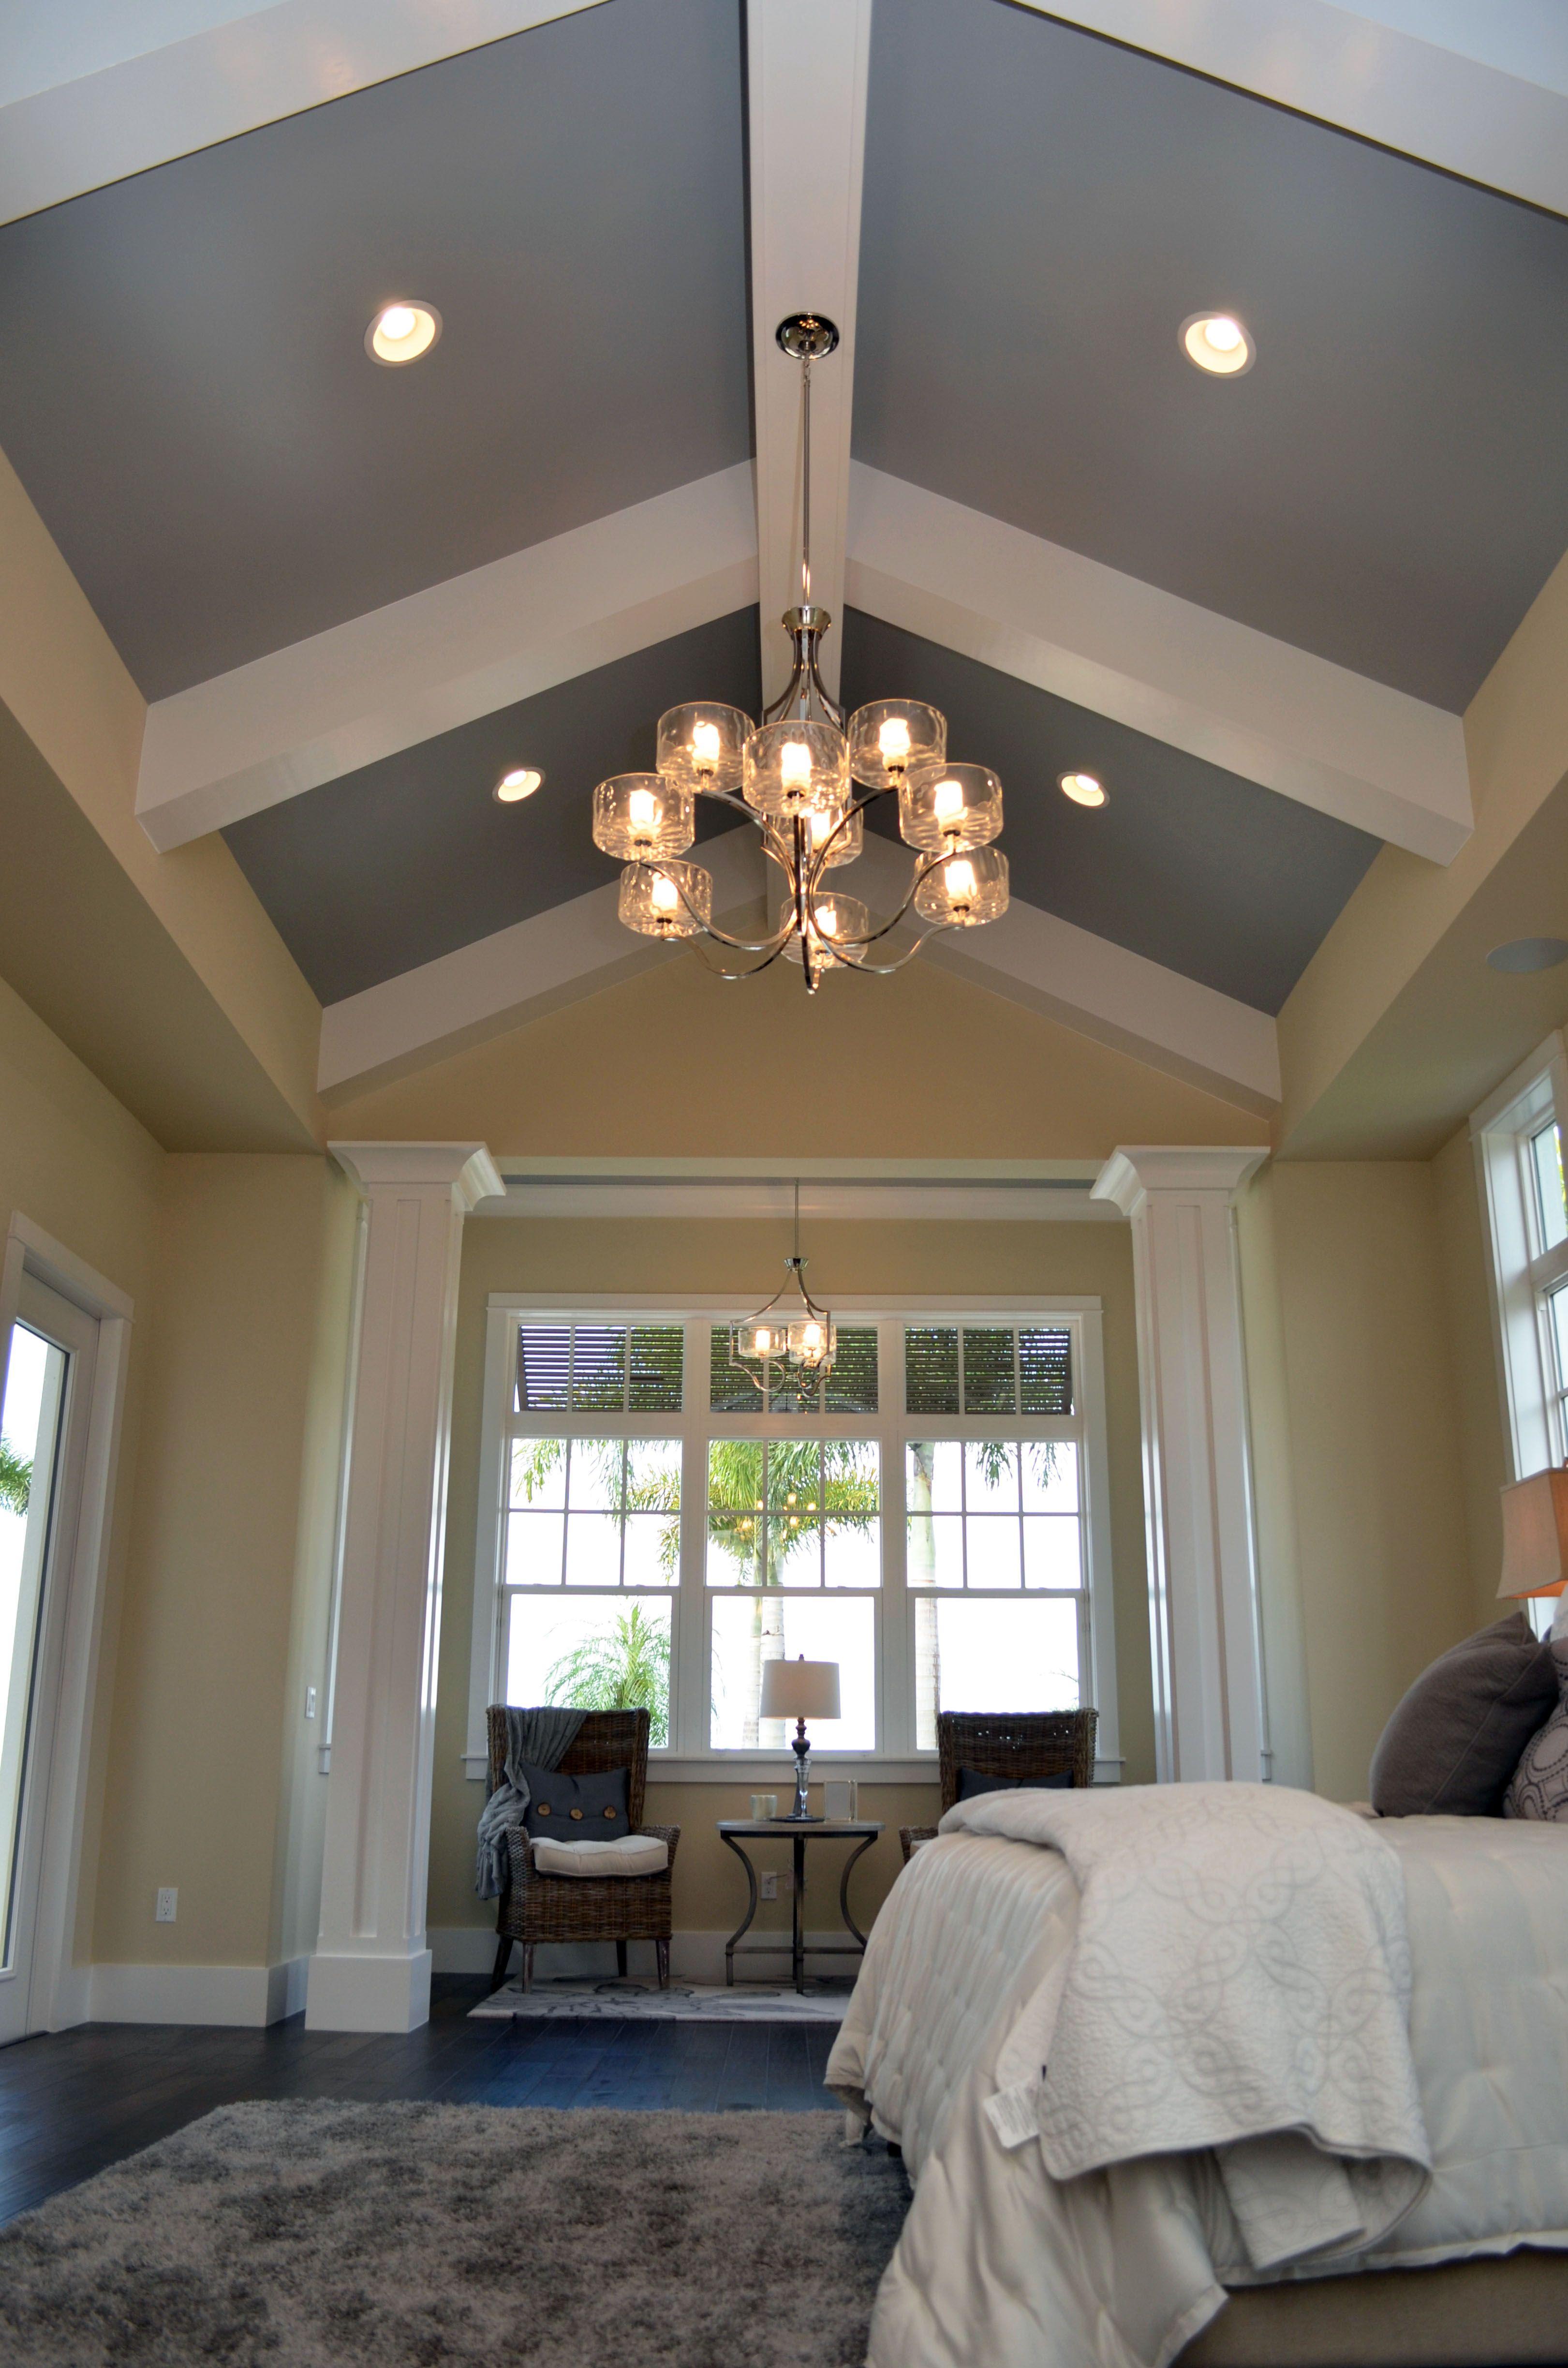 Interior Design Bedroom Vaulted Ceiling Vaulted Ceiling Bedroom